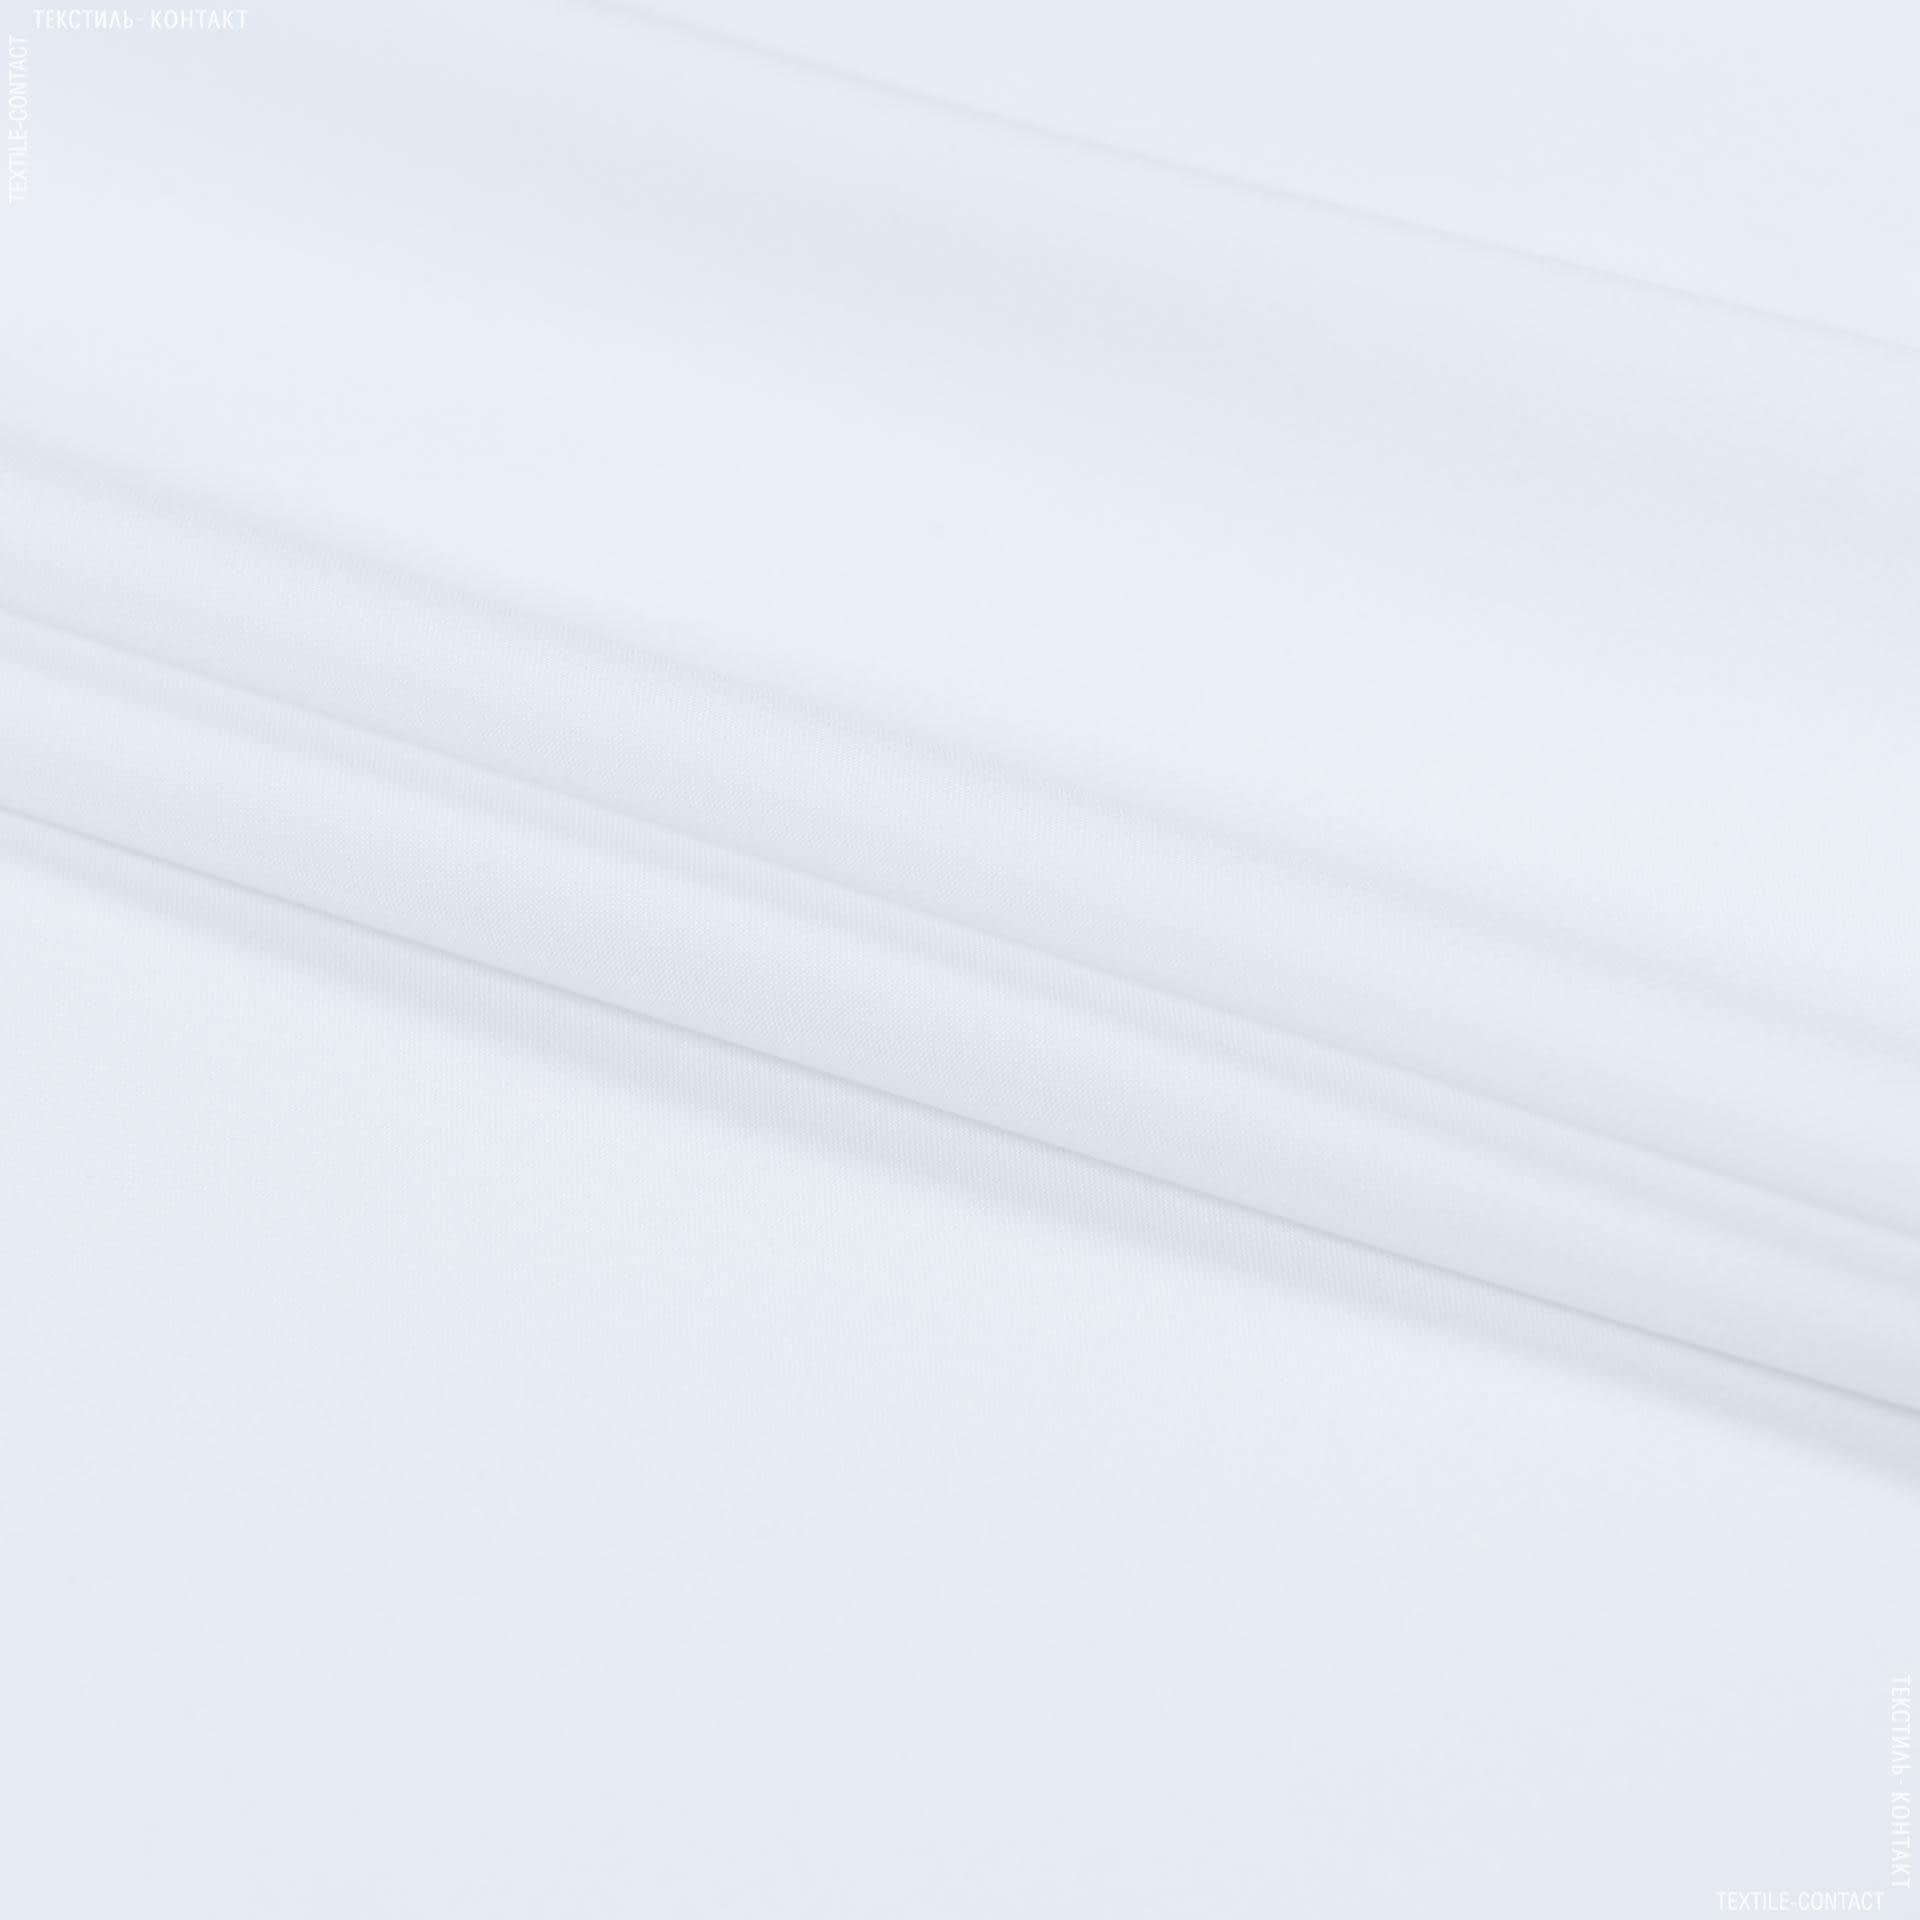 Ткани подкладочная ткань - Подкладочная белый